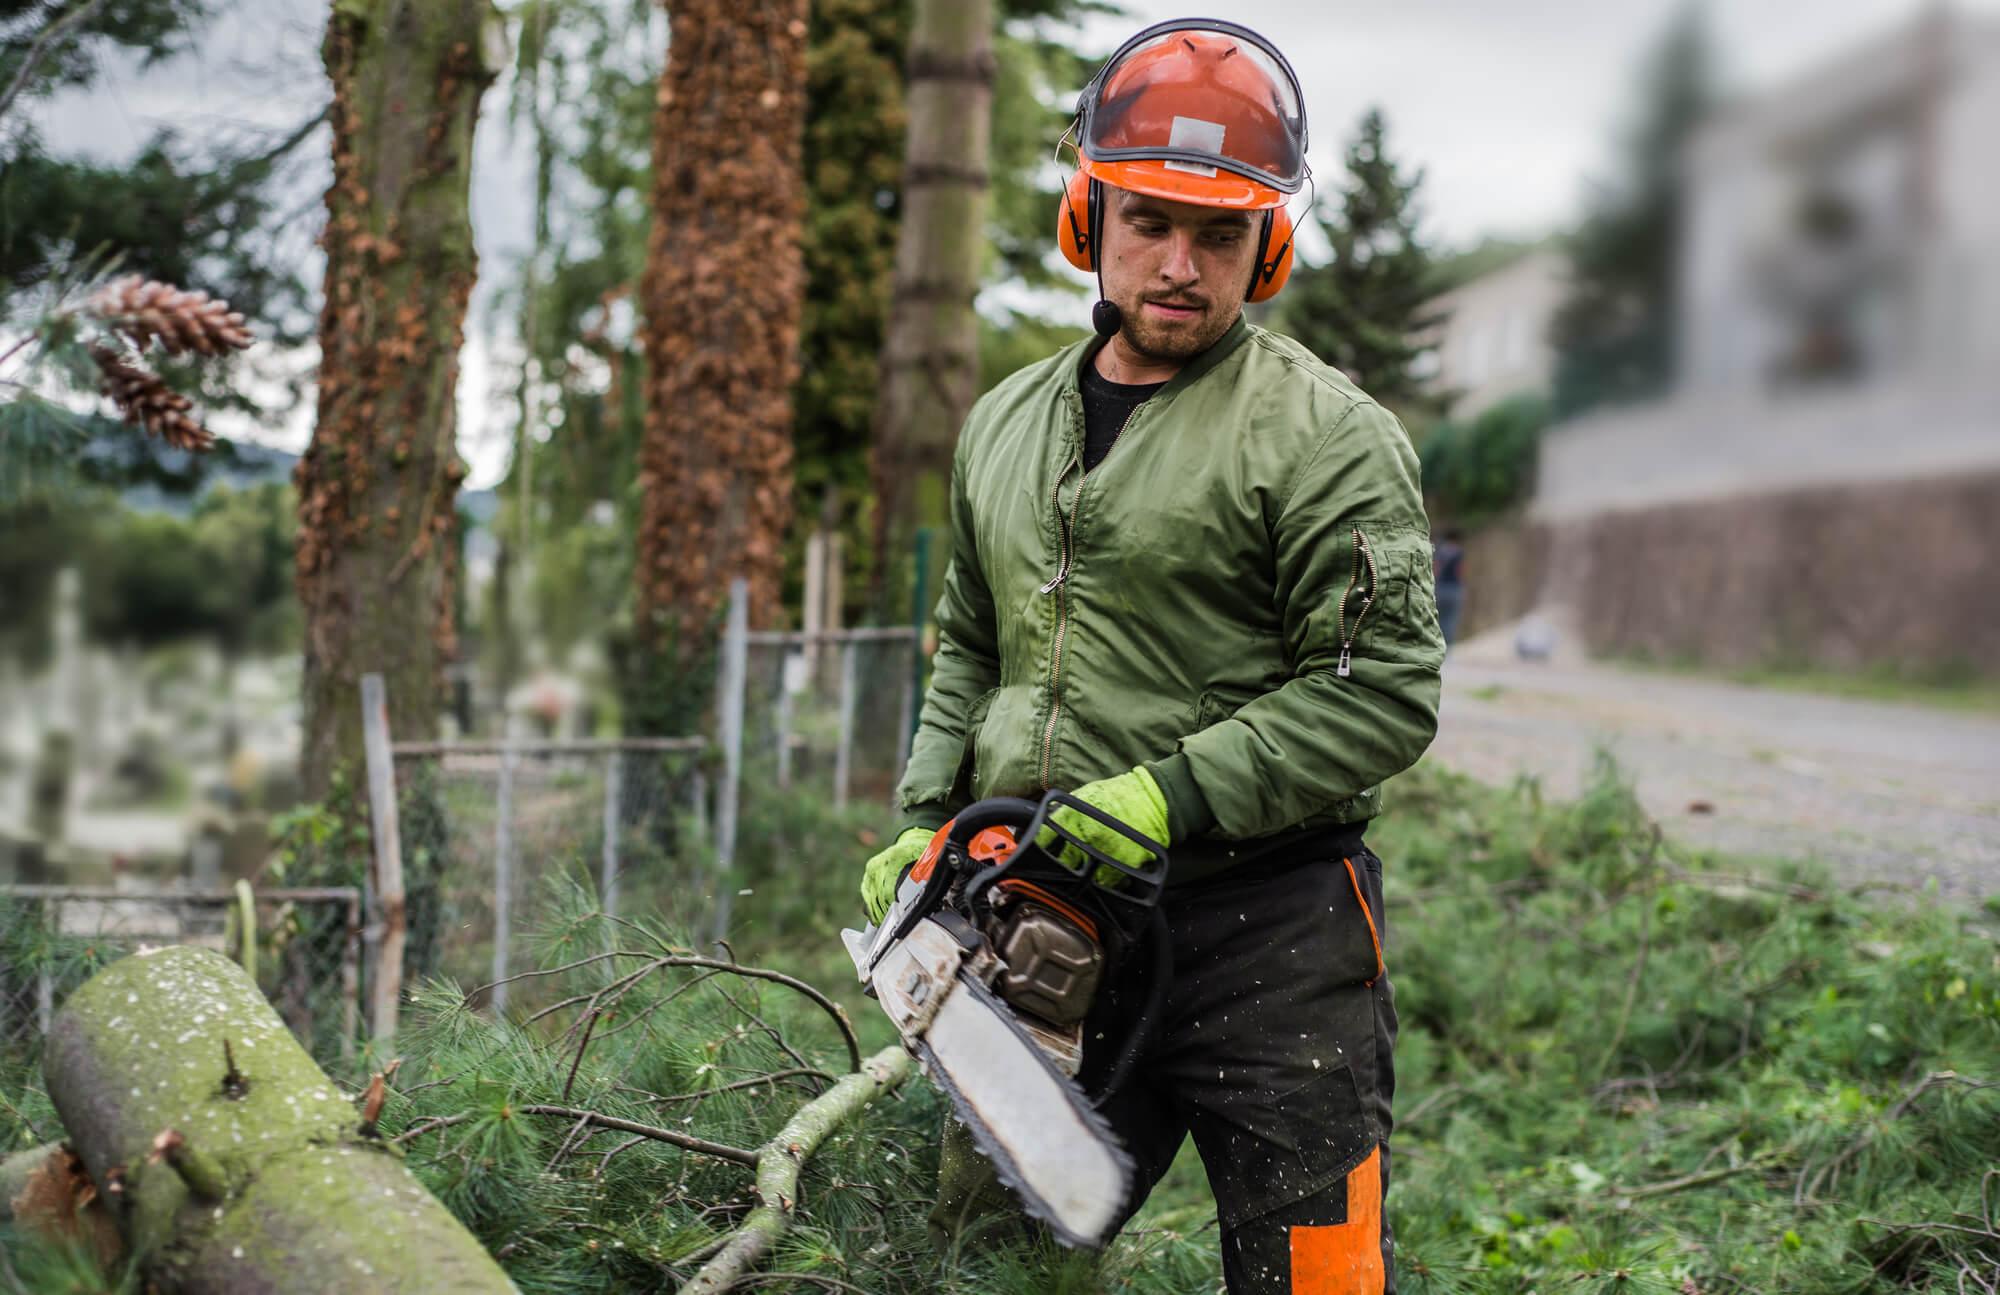 laplace tree arborist - Big Easy Tree Removal